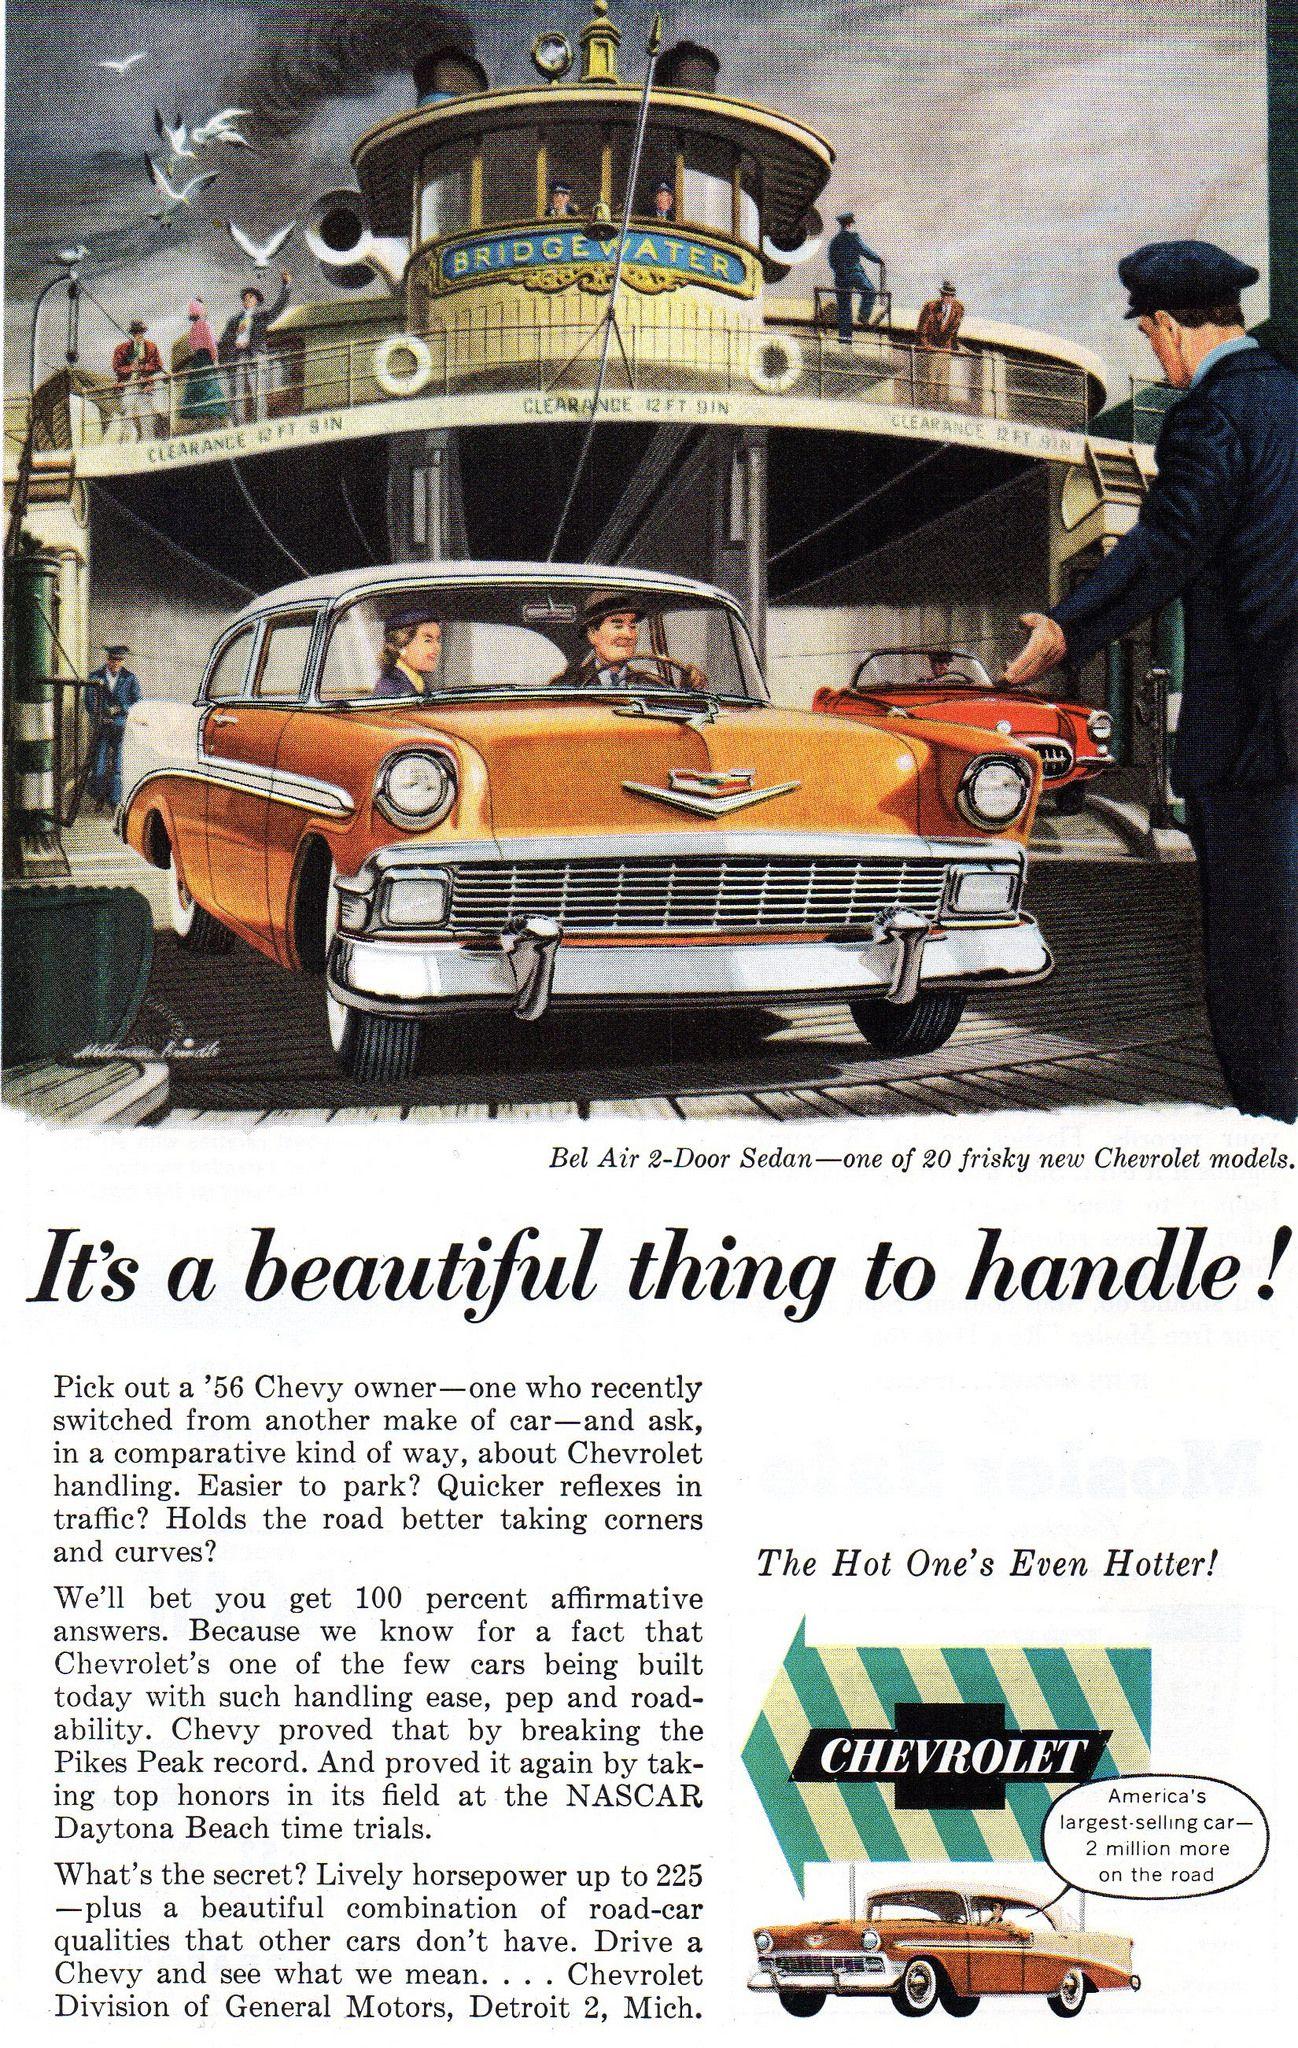 1956 Chevrolet Bel Air 2 Door Sedan Corvette Usa Original Magazine Advertsement Chevrolet Bel Air Chevrolet Classic Cars